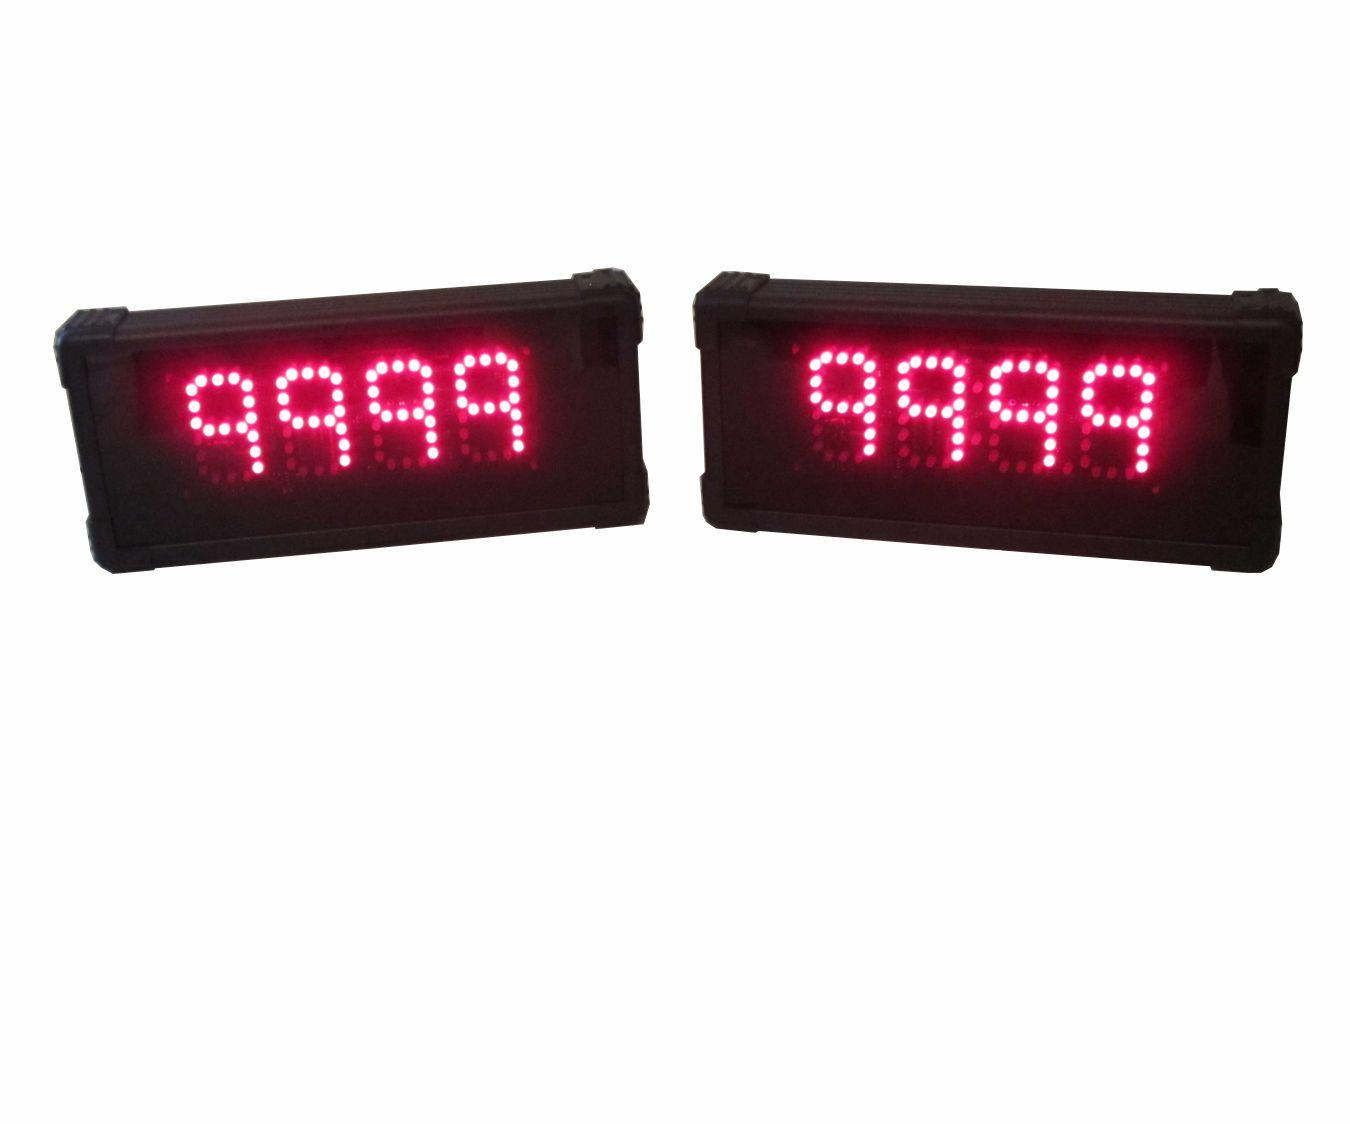 Two-Team 4-digit Gameshow Scoreboards